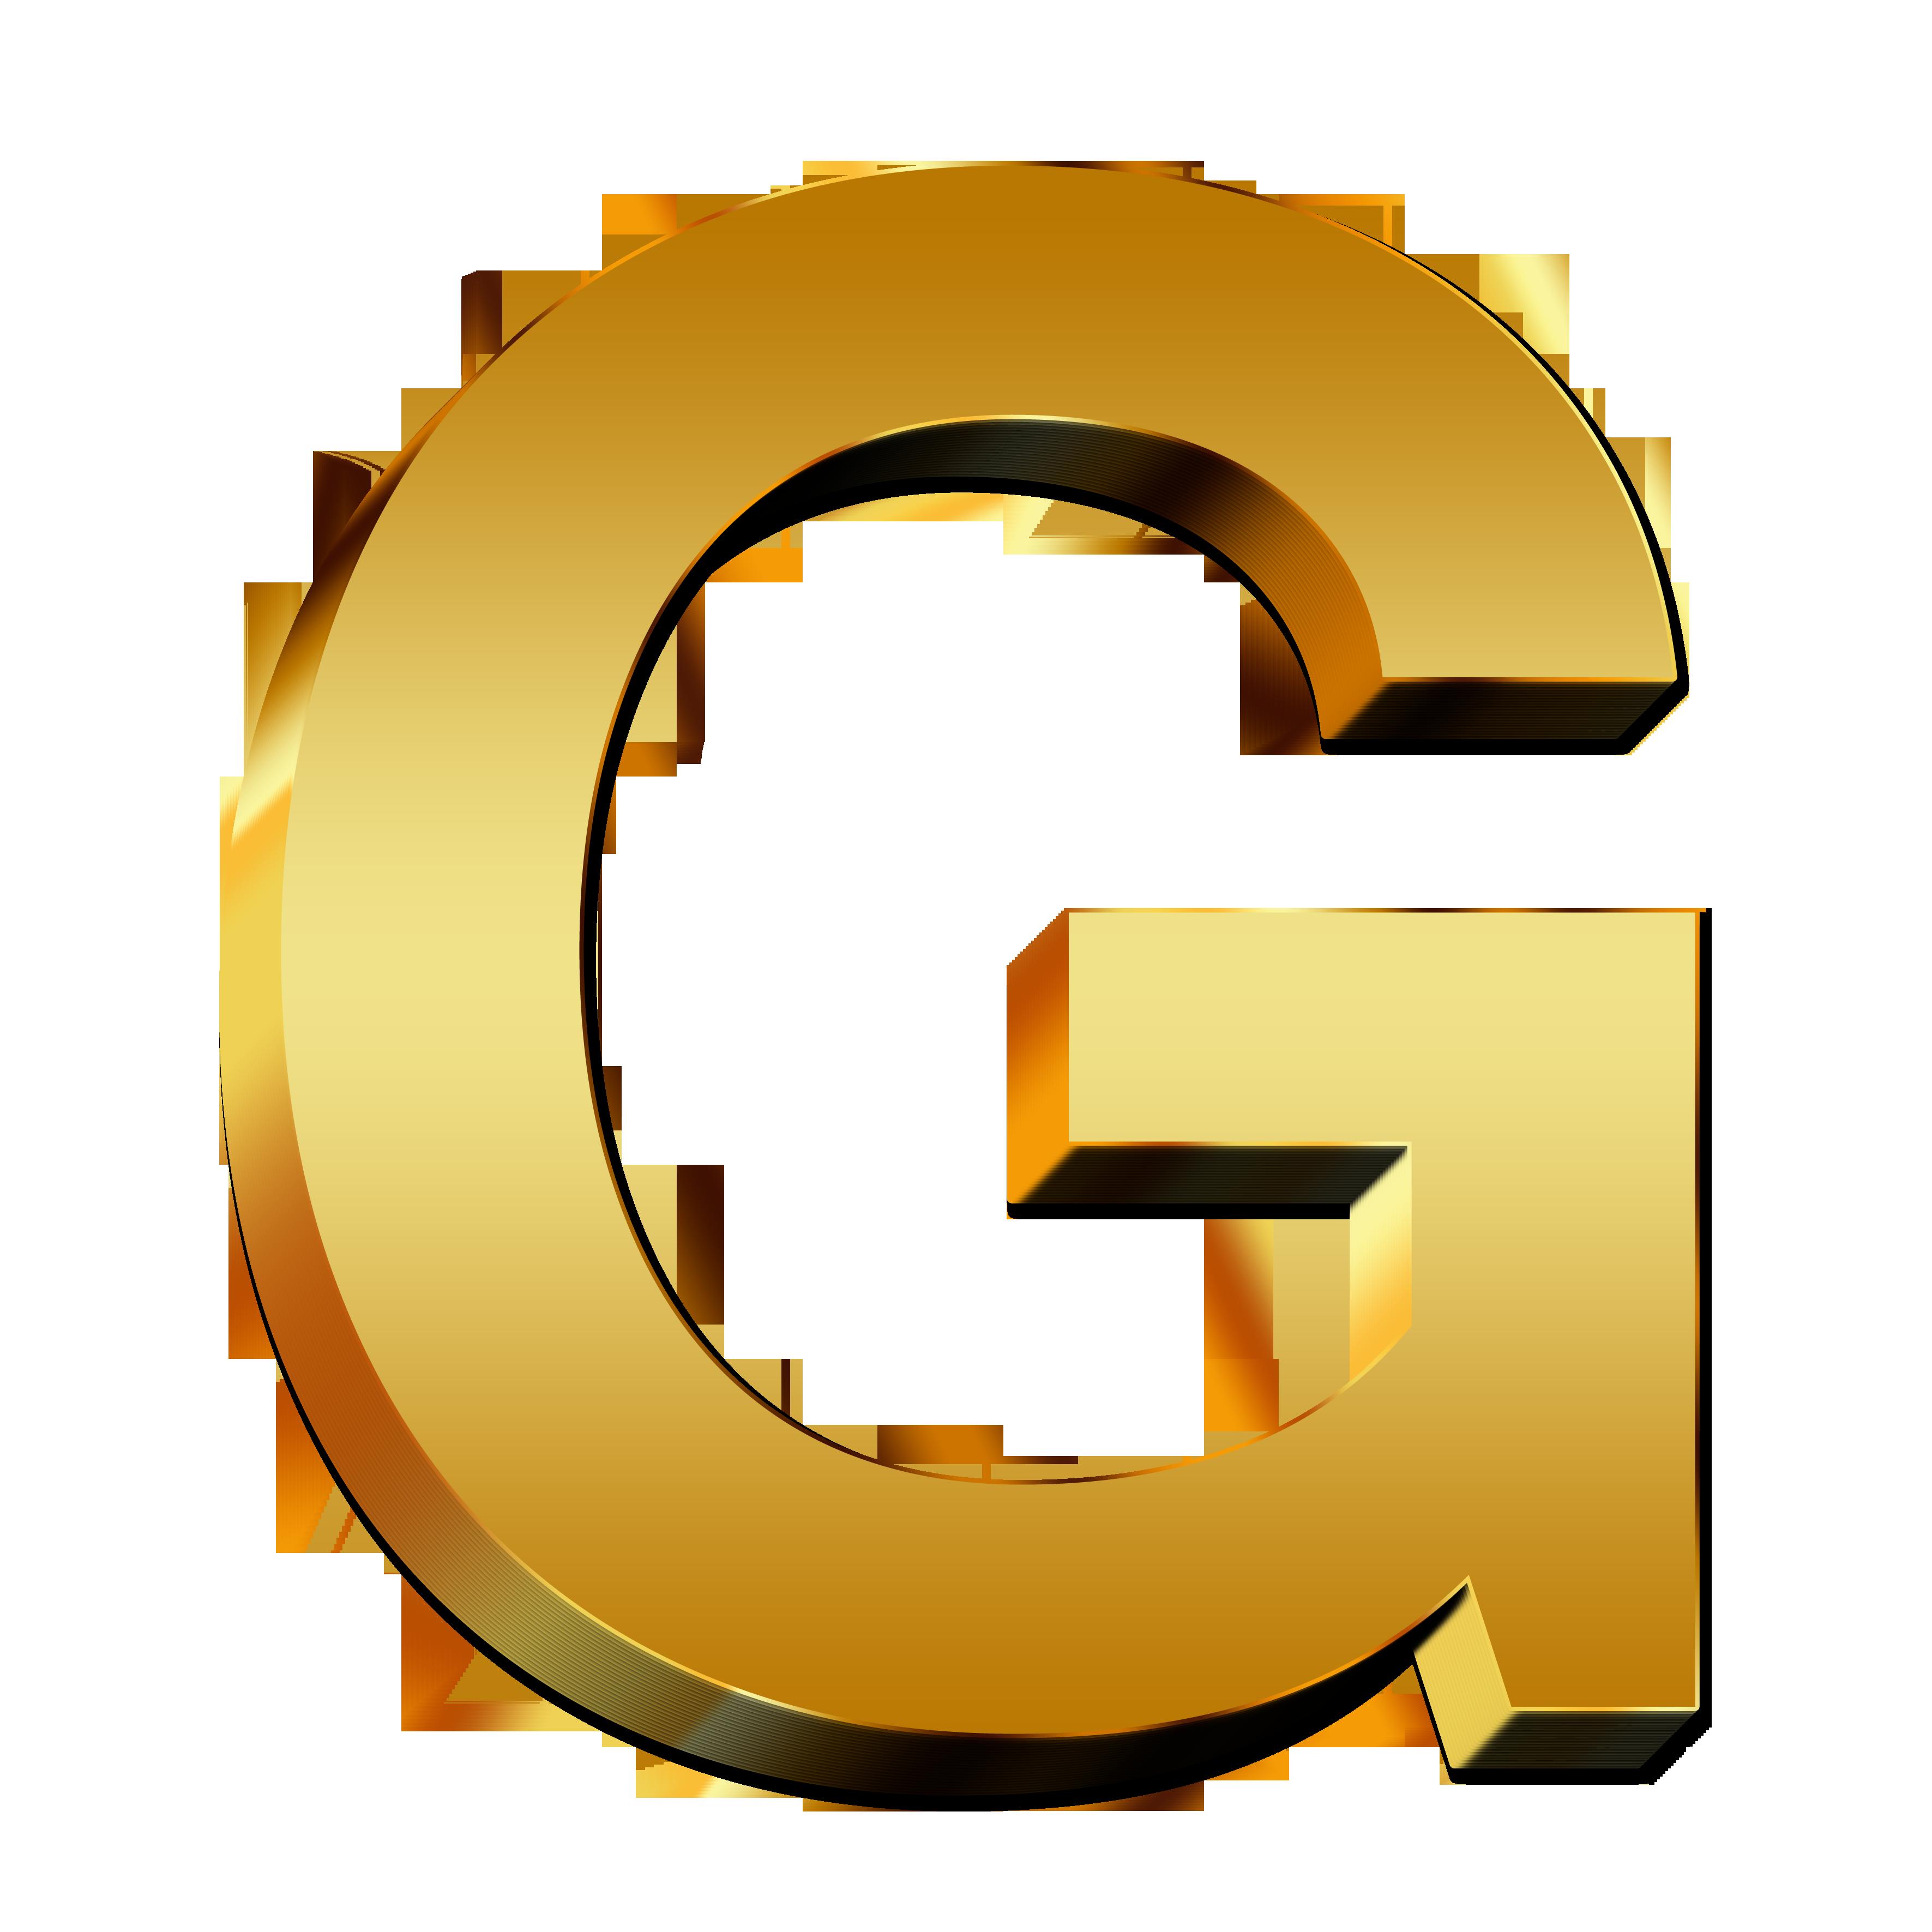 Letter G PNG images free download